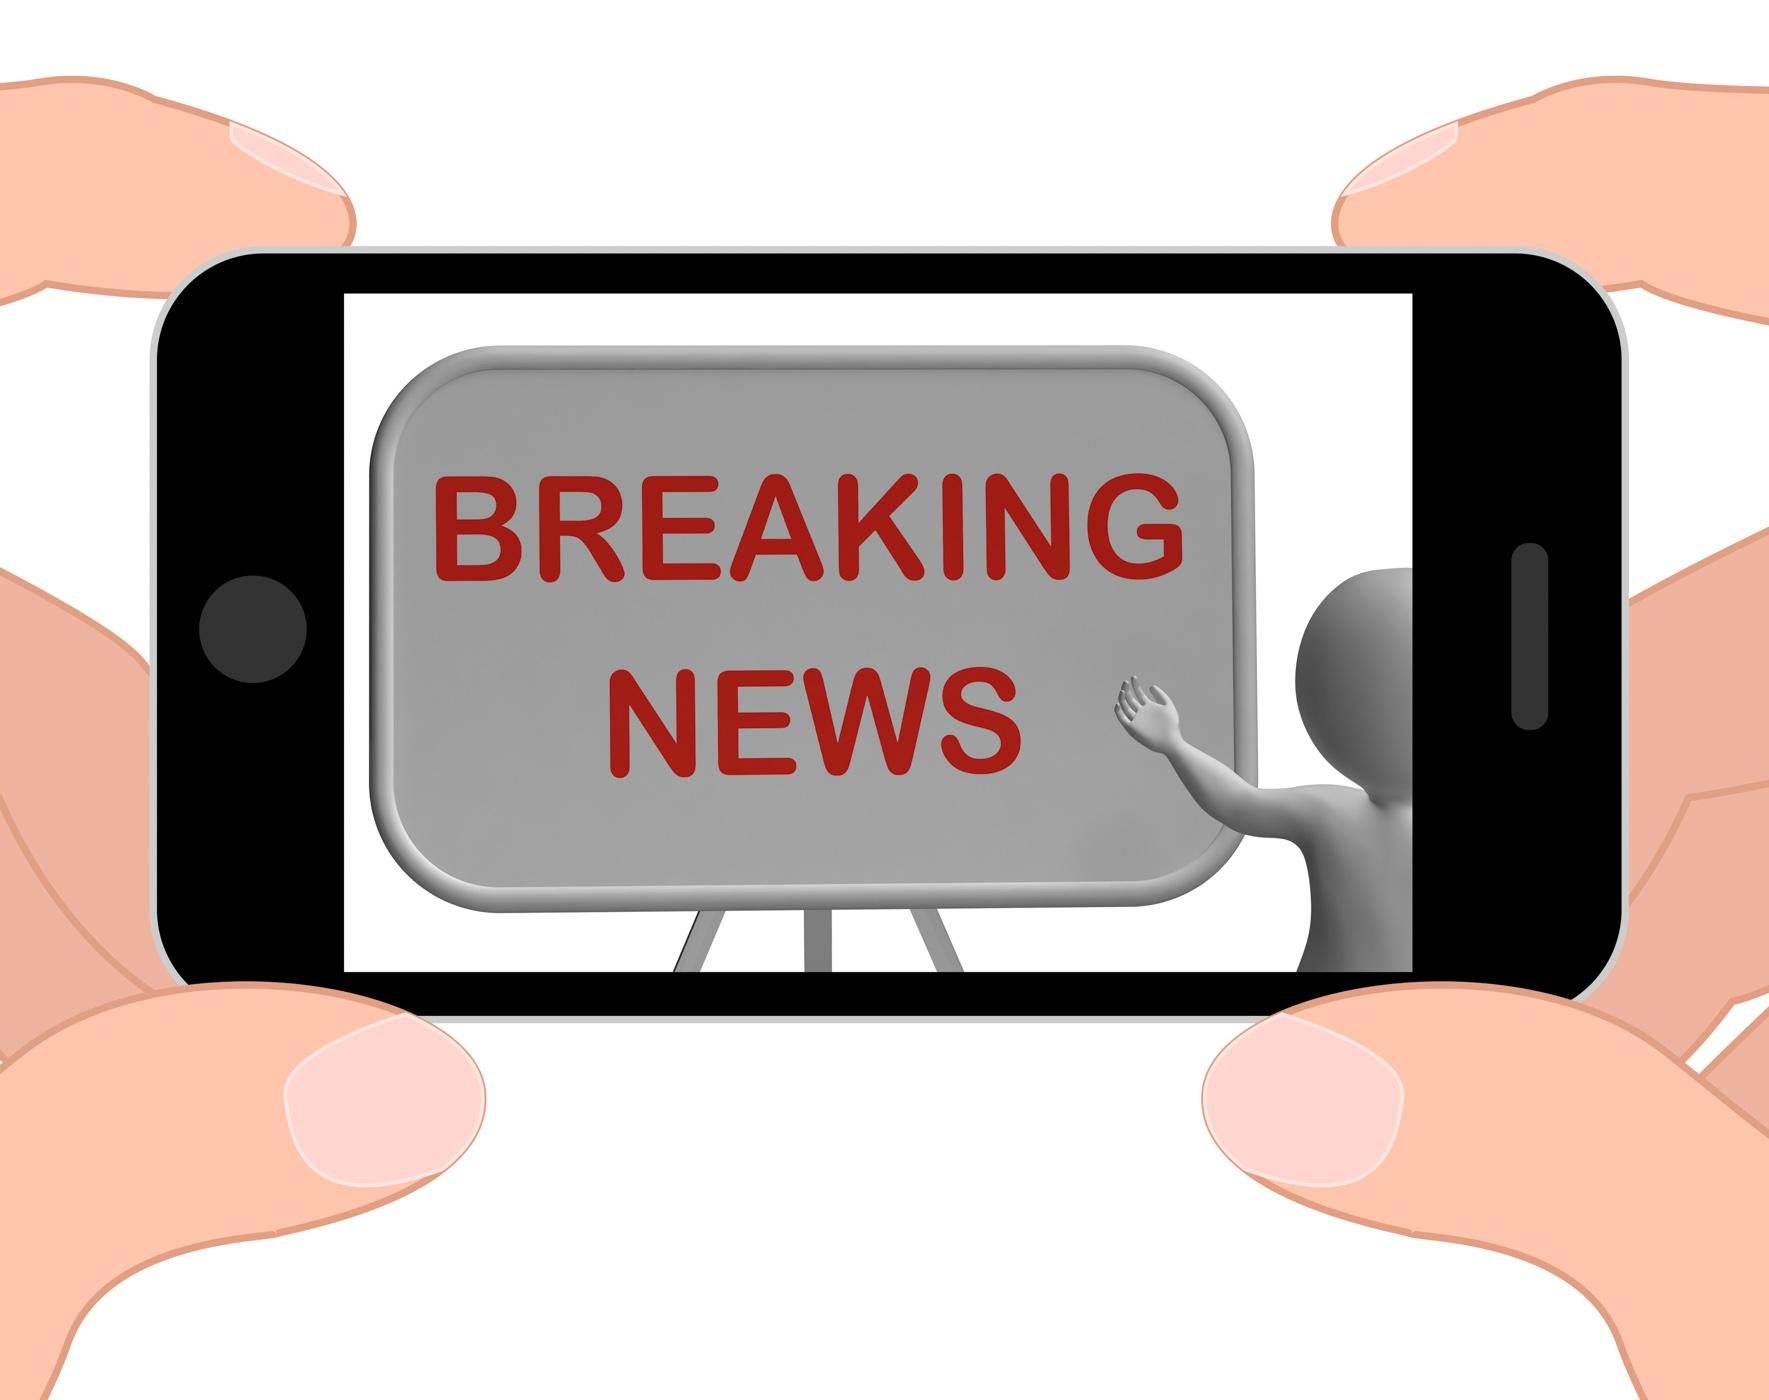 Breaking news phone shows major developments and bulletin photo